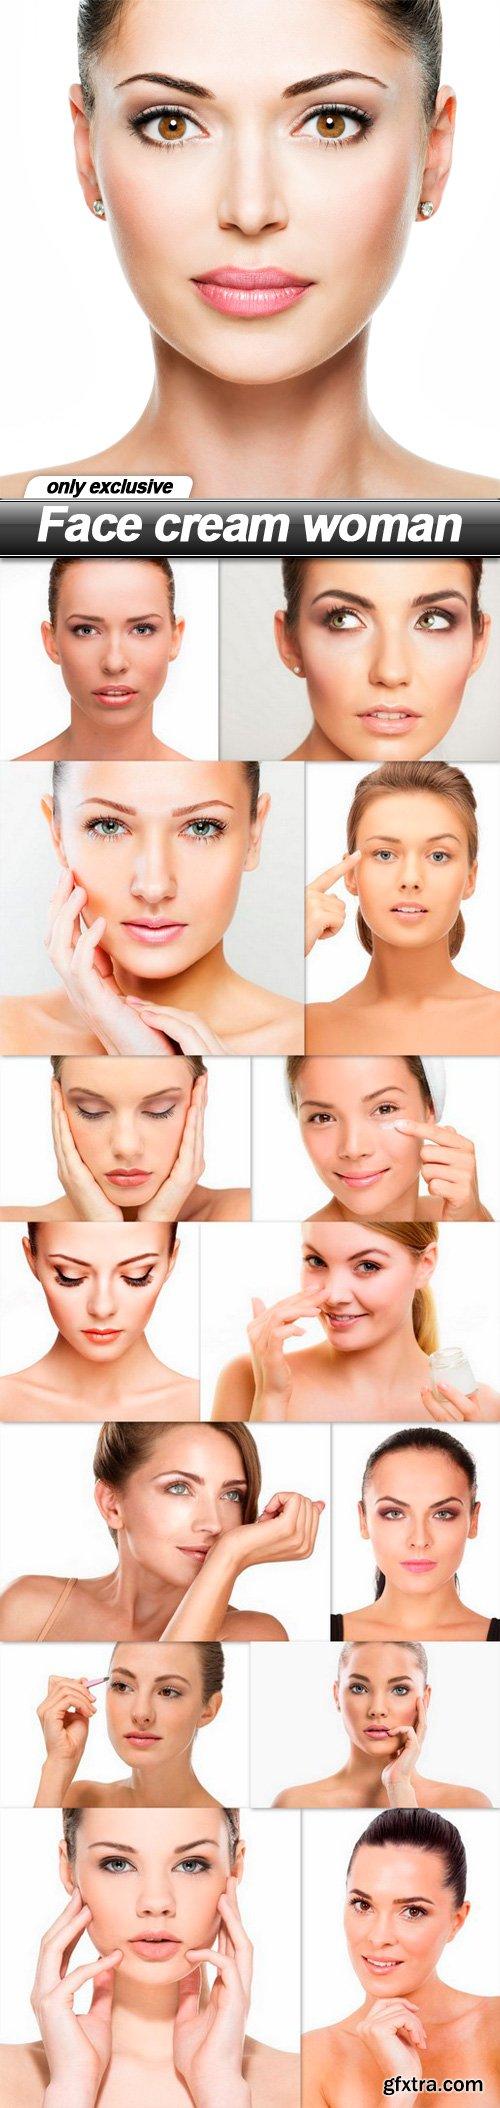 Face cream woman - 15 UHQ JPEG